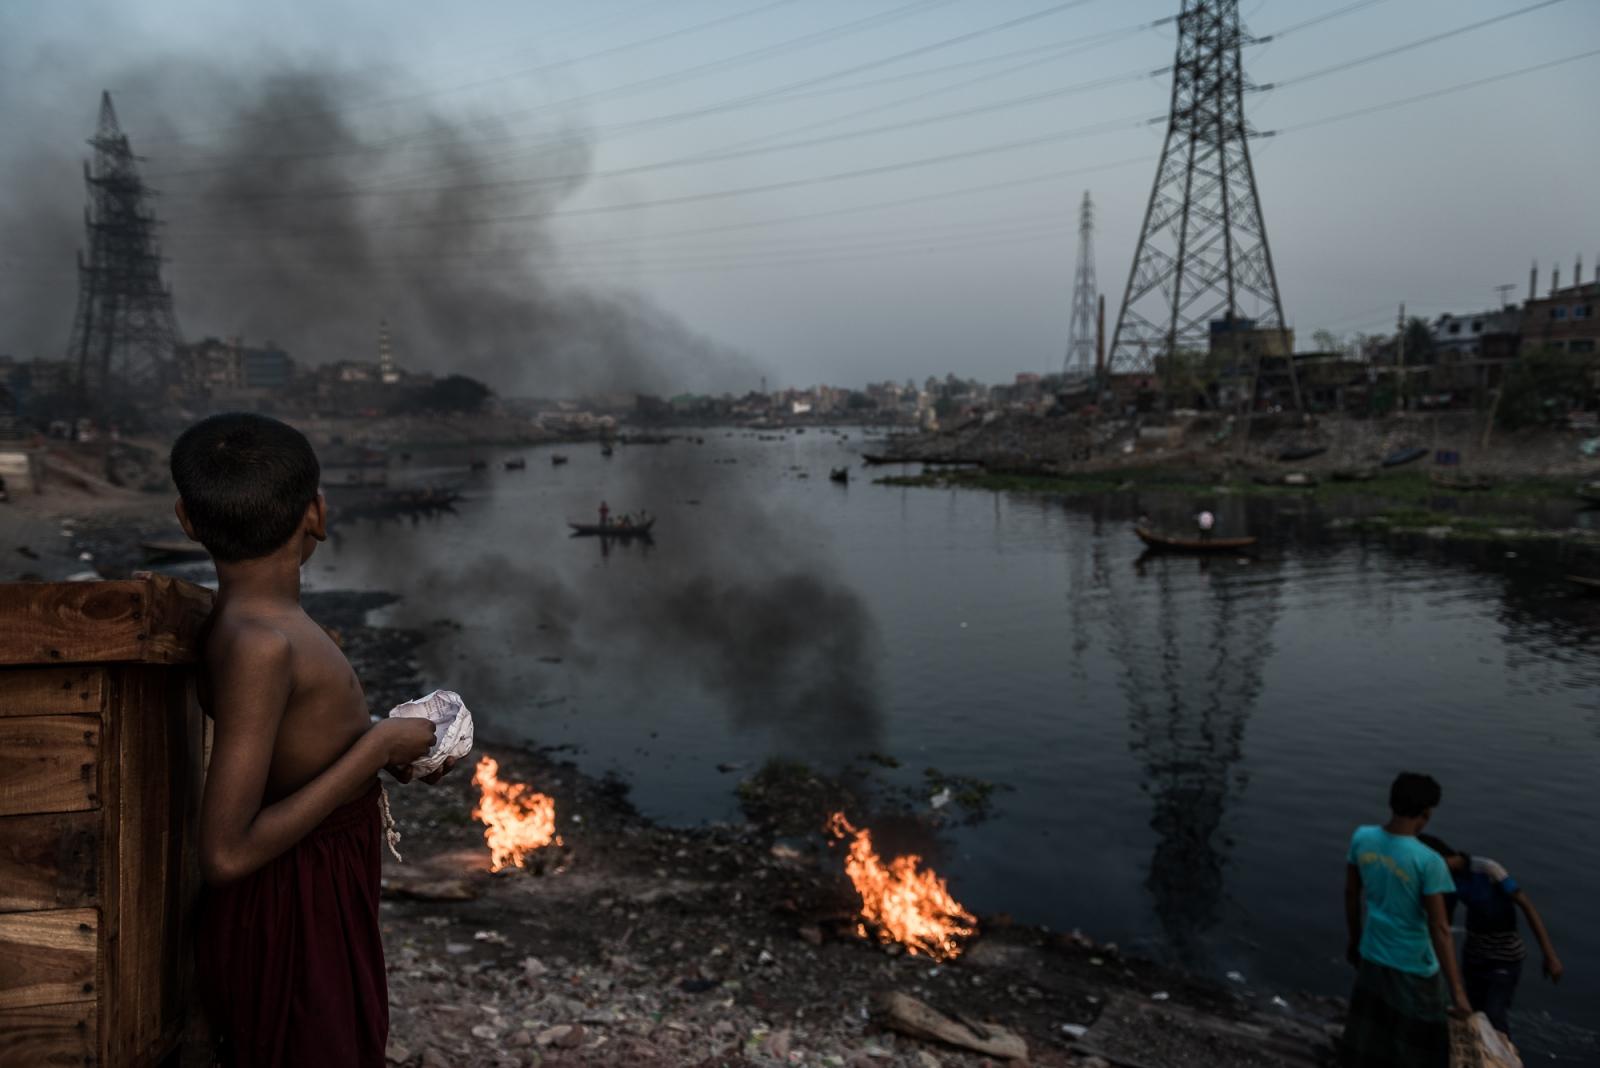 Art and Documentary Photography - Loading Climate_changed_-_Ignacio_Marin-17.jpg